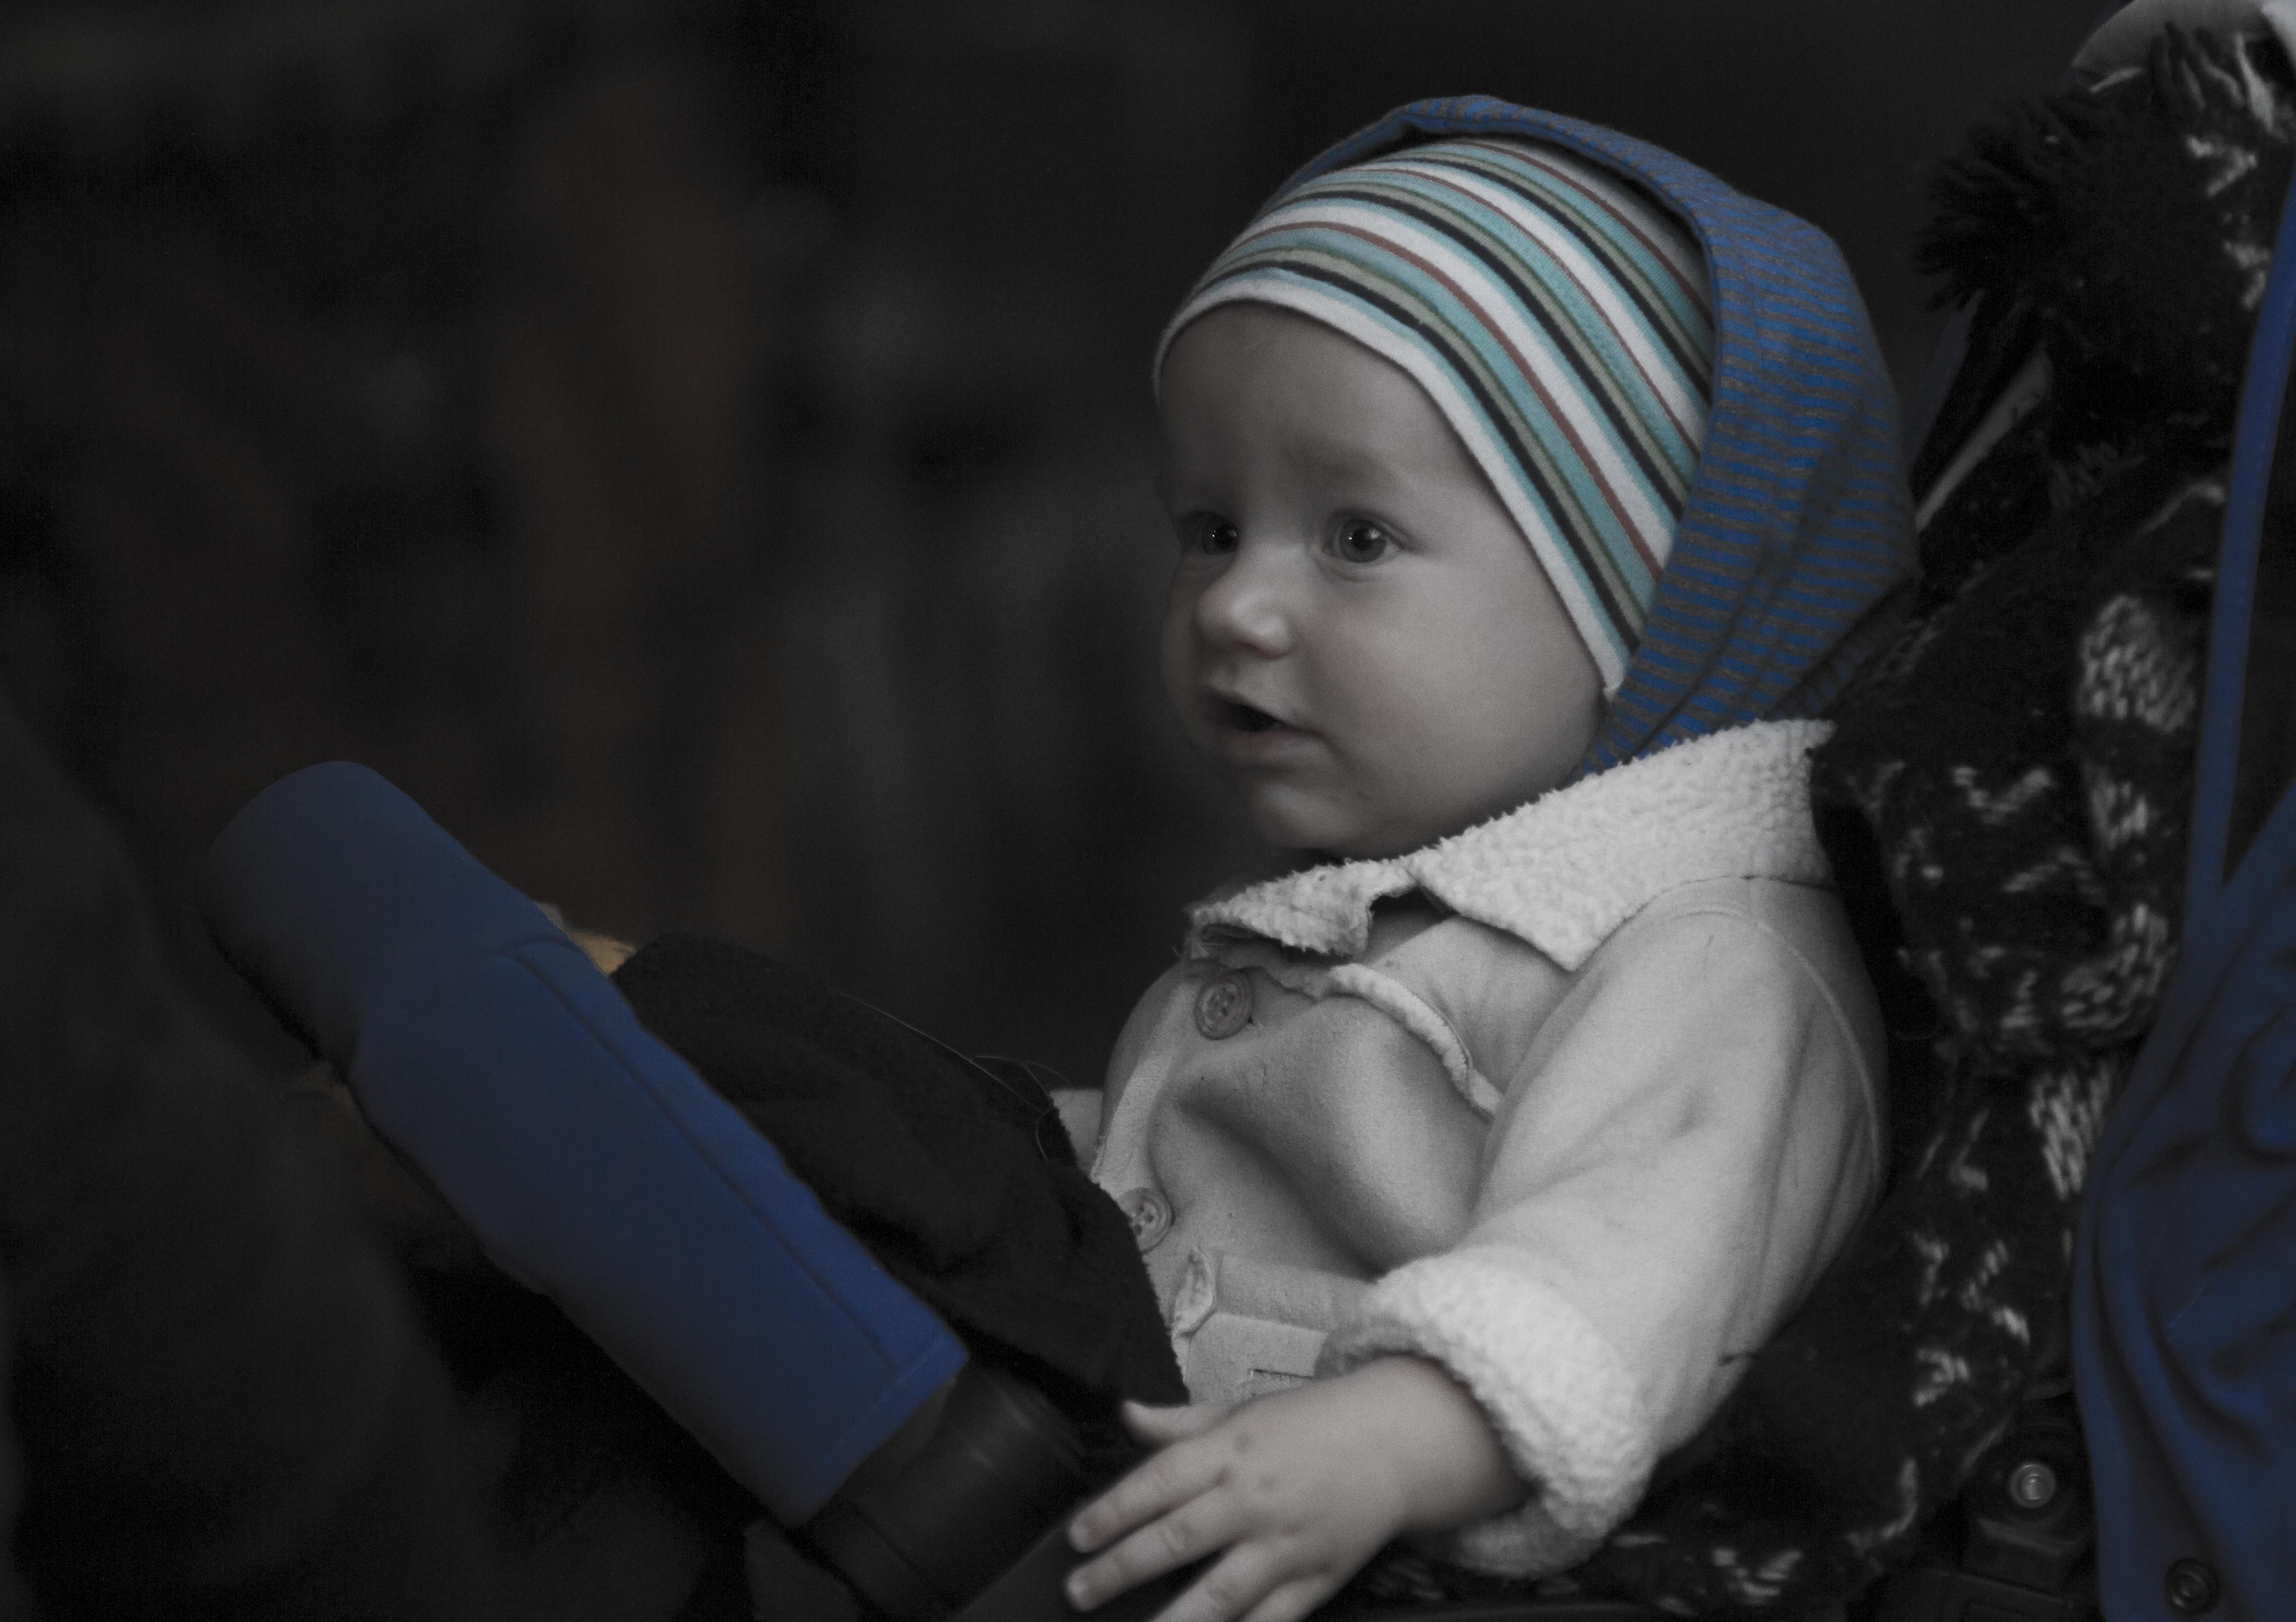 Baby_Pram